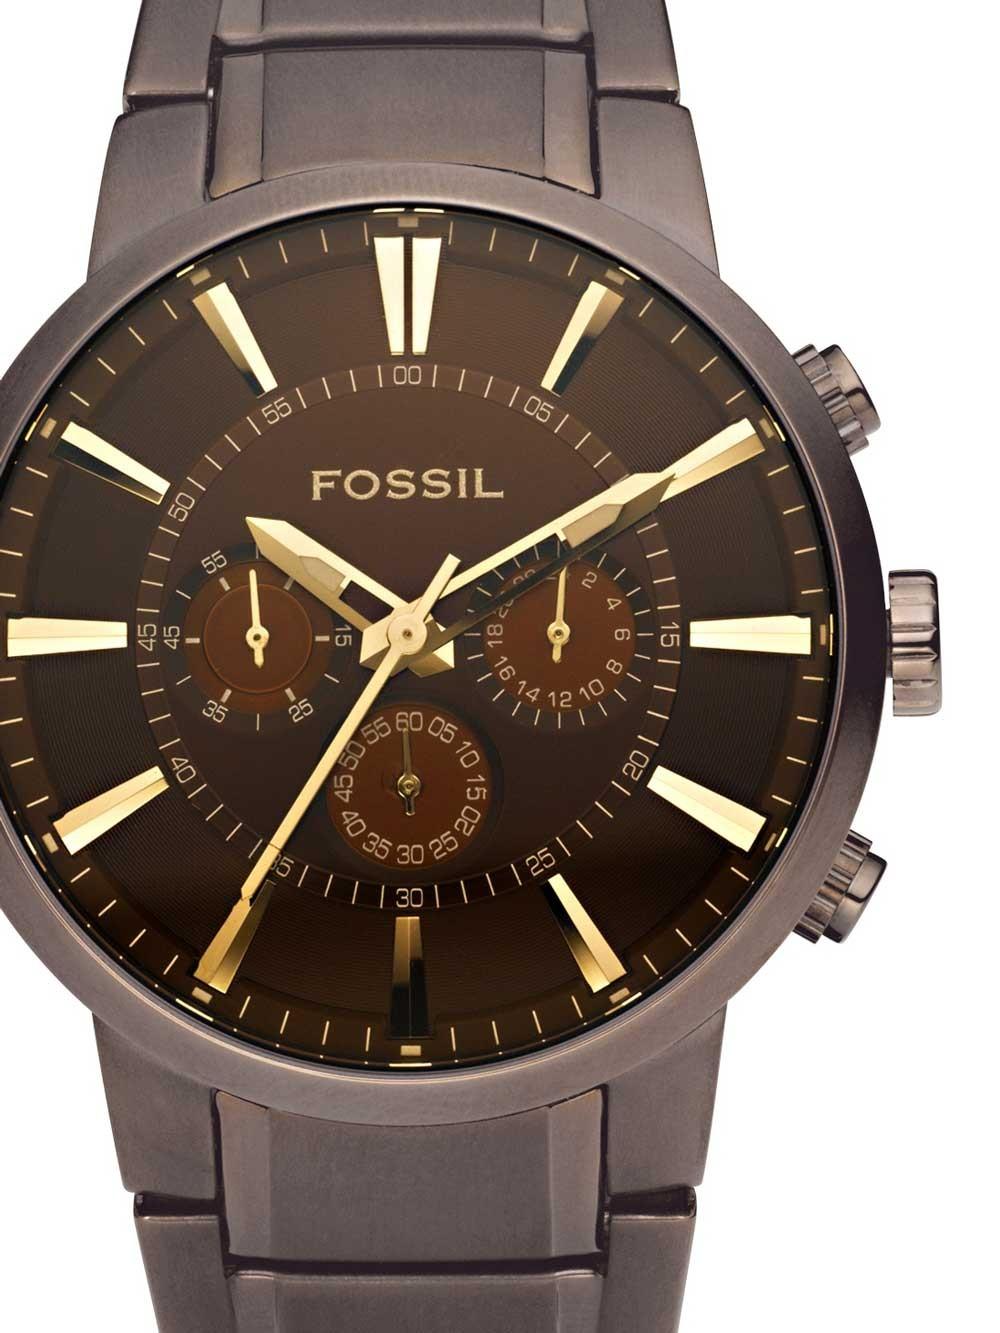 watches chrono12 fossil fs4357 other men herren. Black Bedroom Furniture Sets. Home Design Ideas